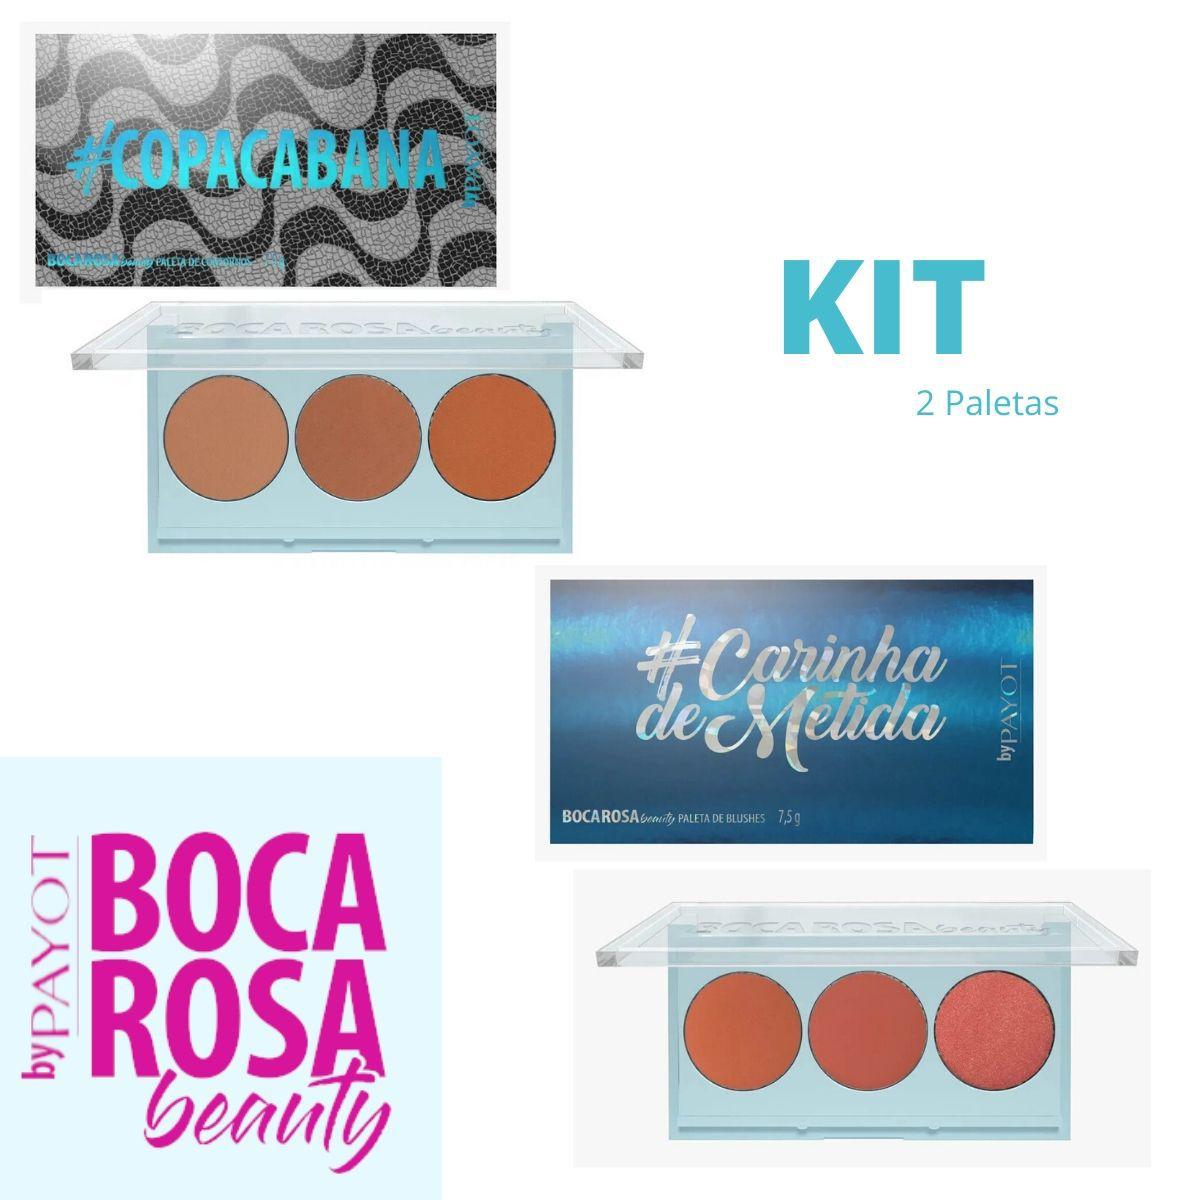 Paleta Carinha de Metida + Copacabana Boca Rosa